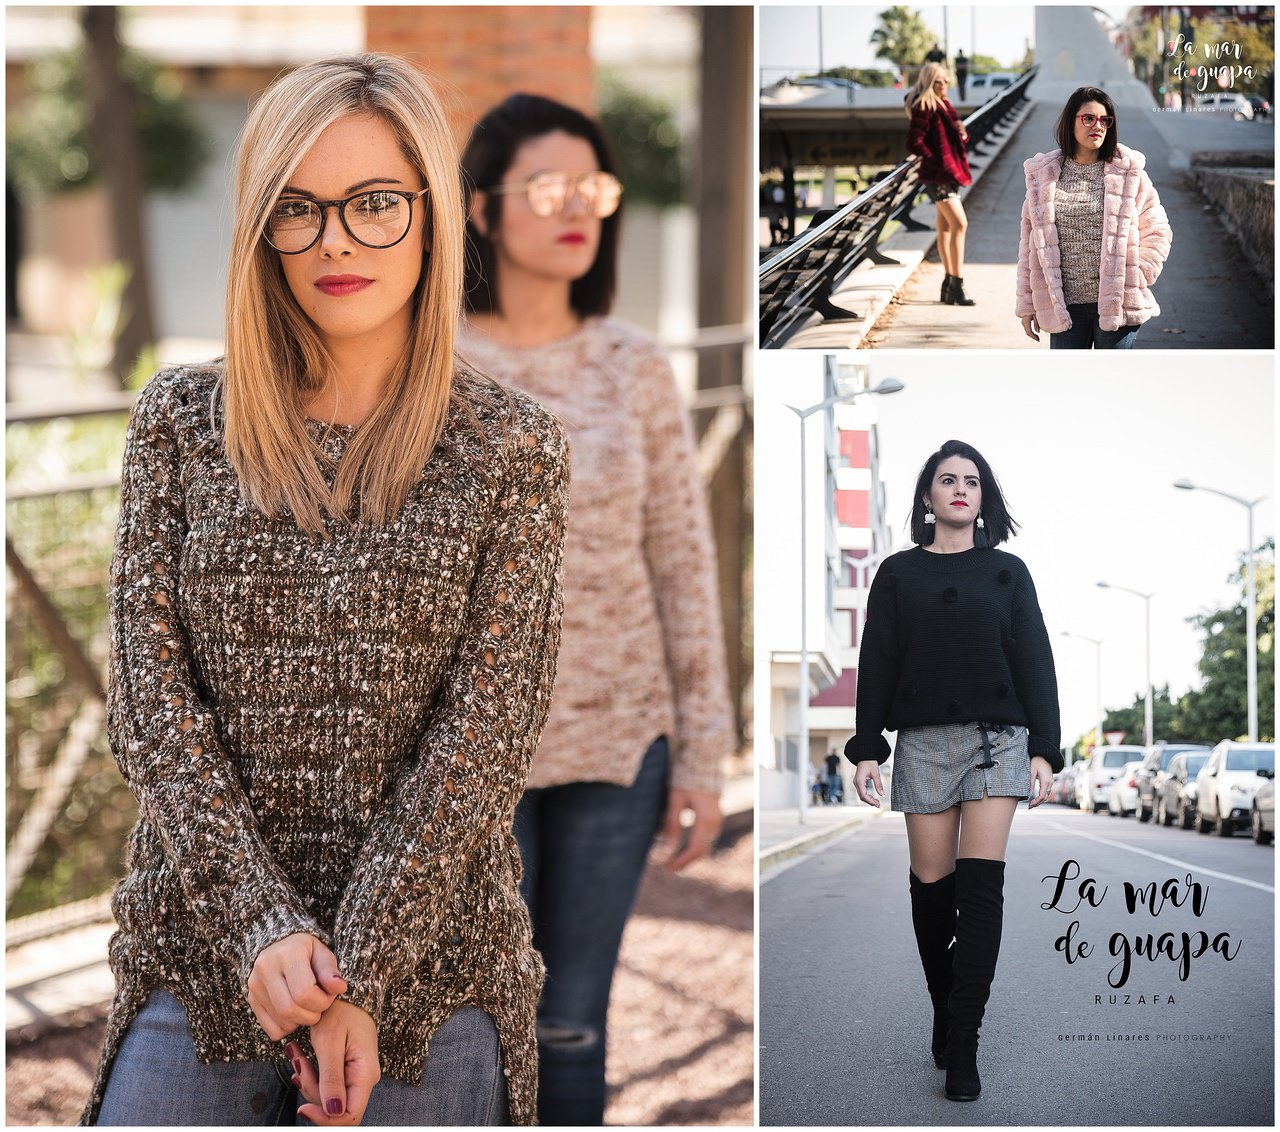 fotografo moda valencia-ruzafa11